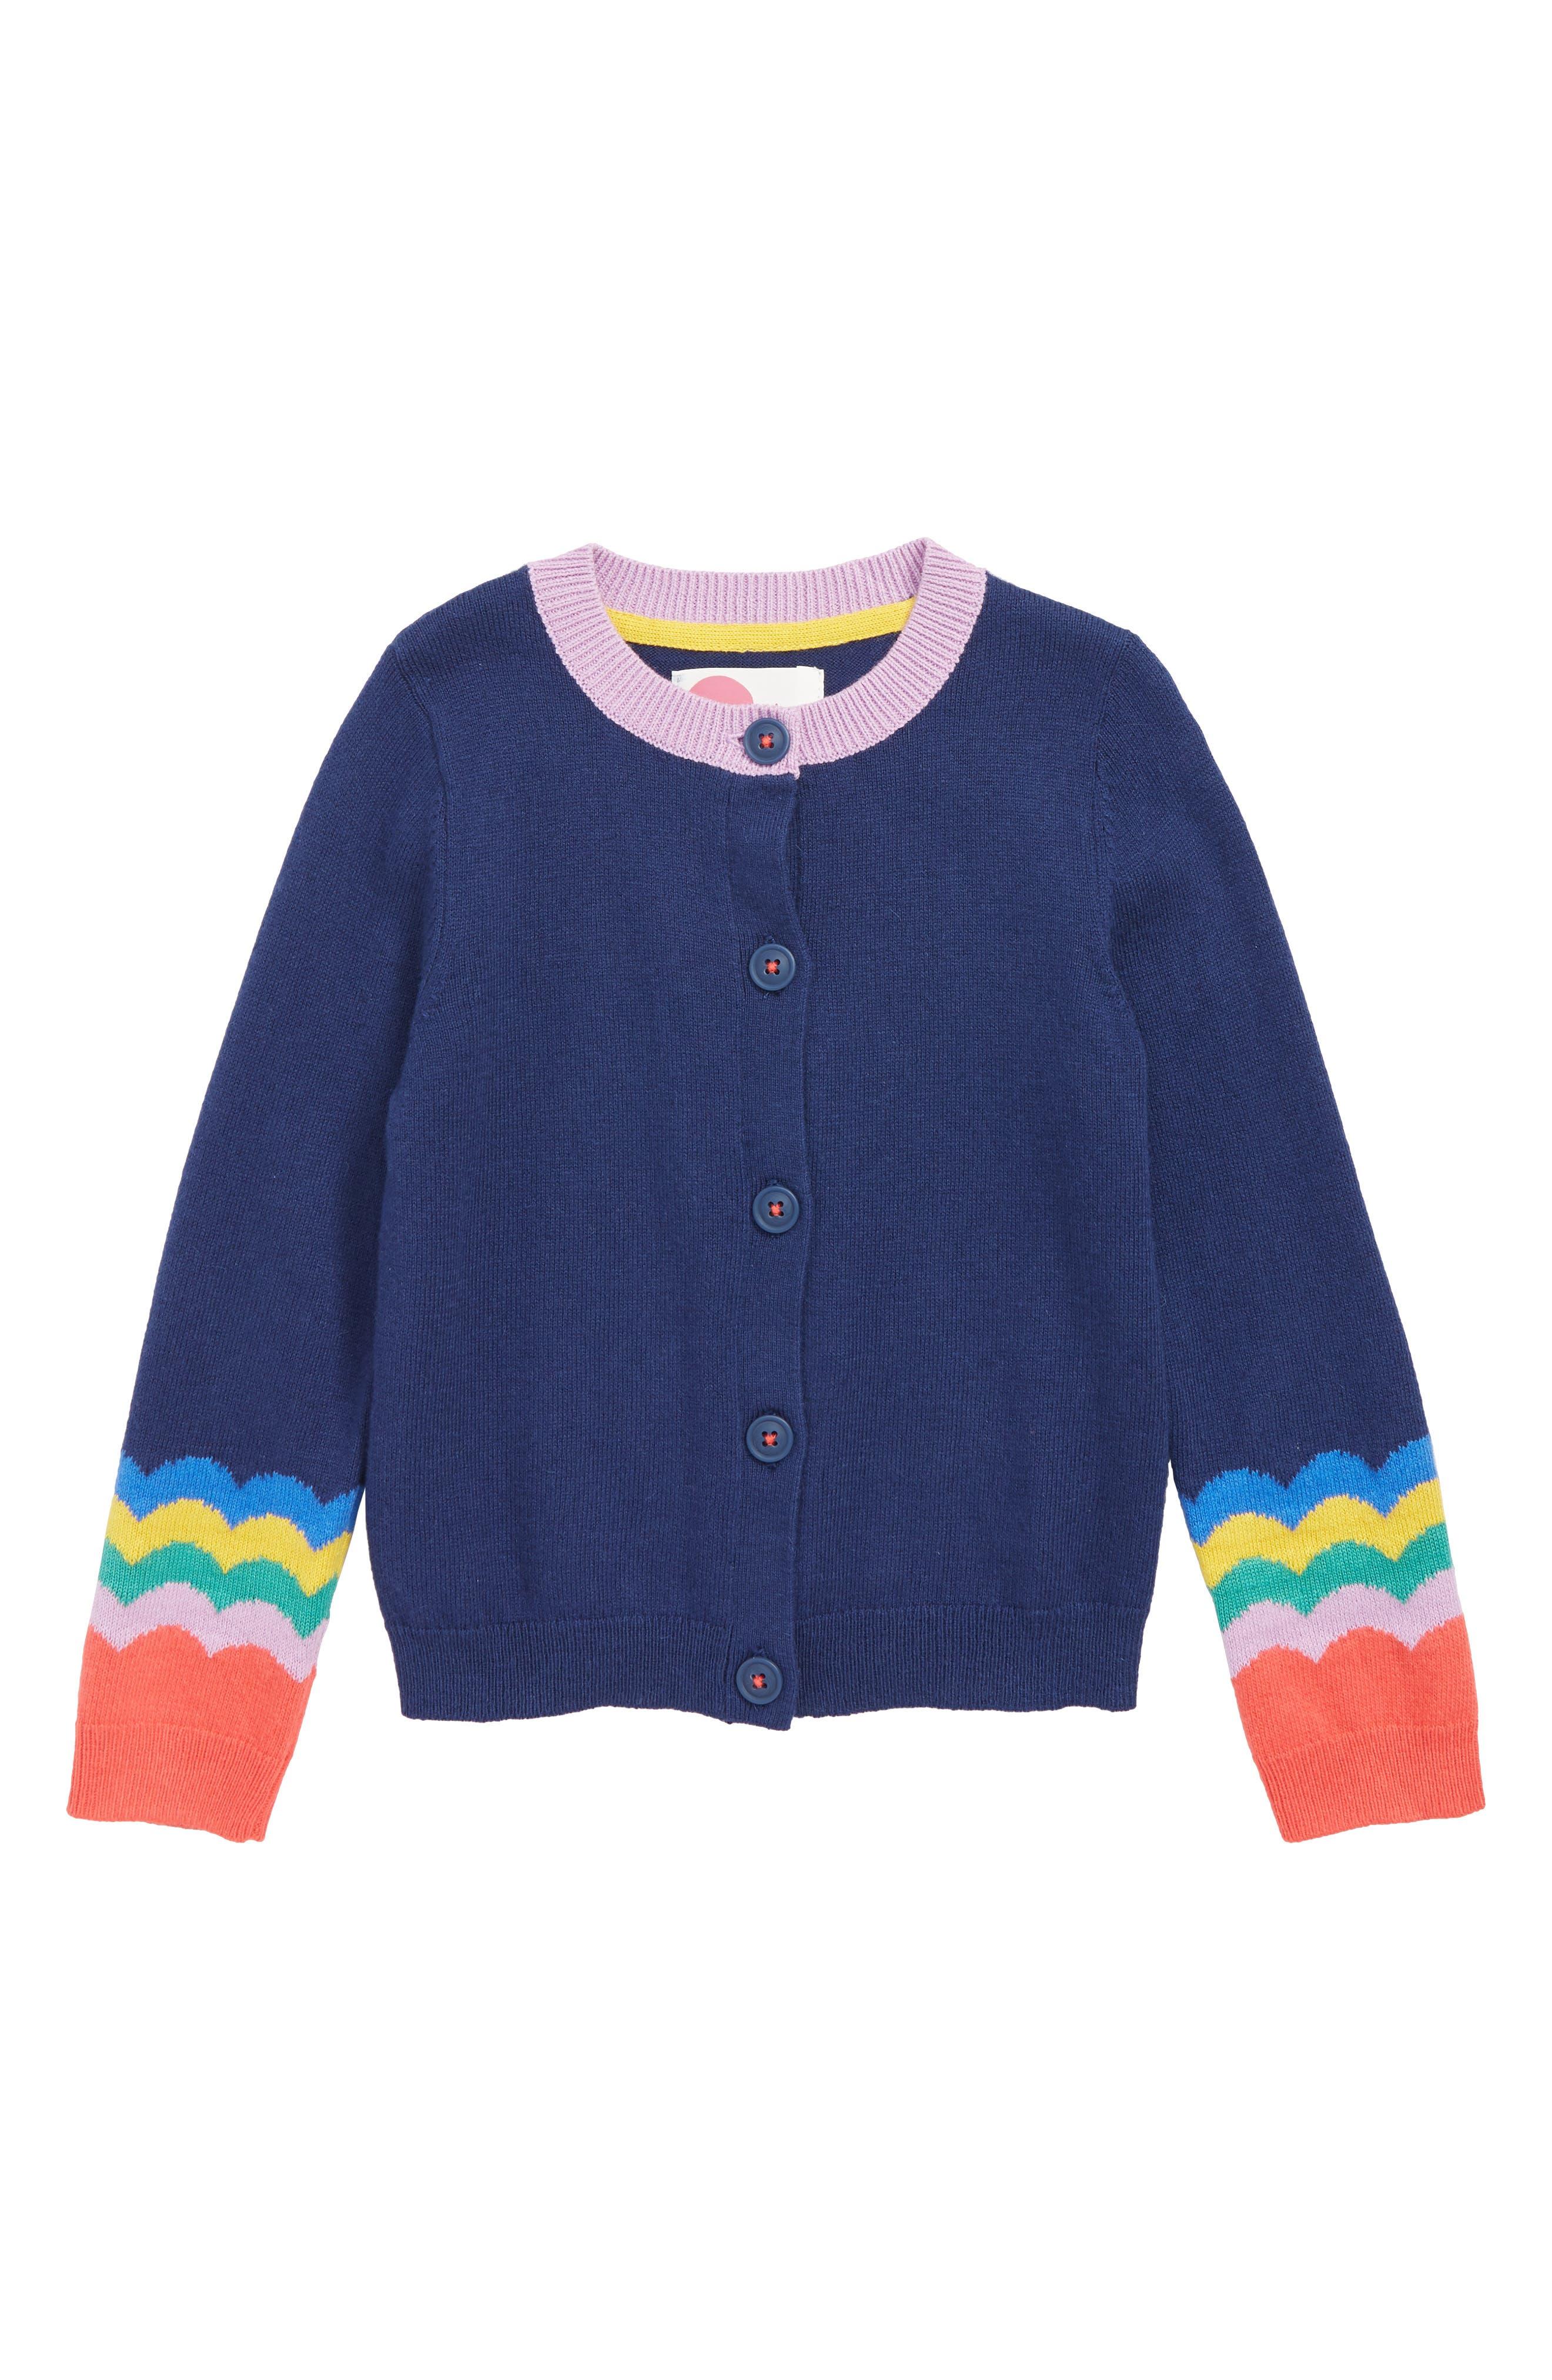 Toddler Girls Mini Boden Fun Cardigan Size 34Y  Blue